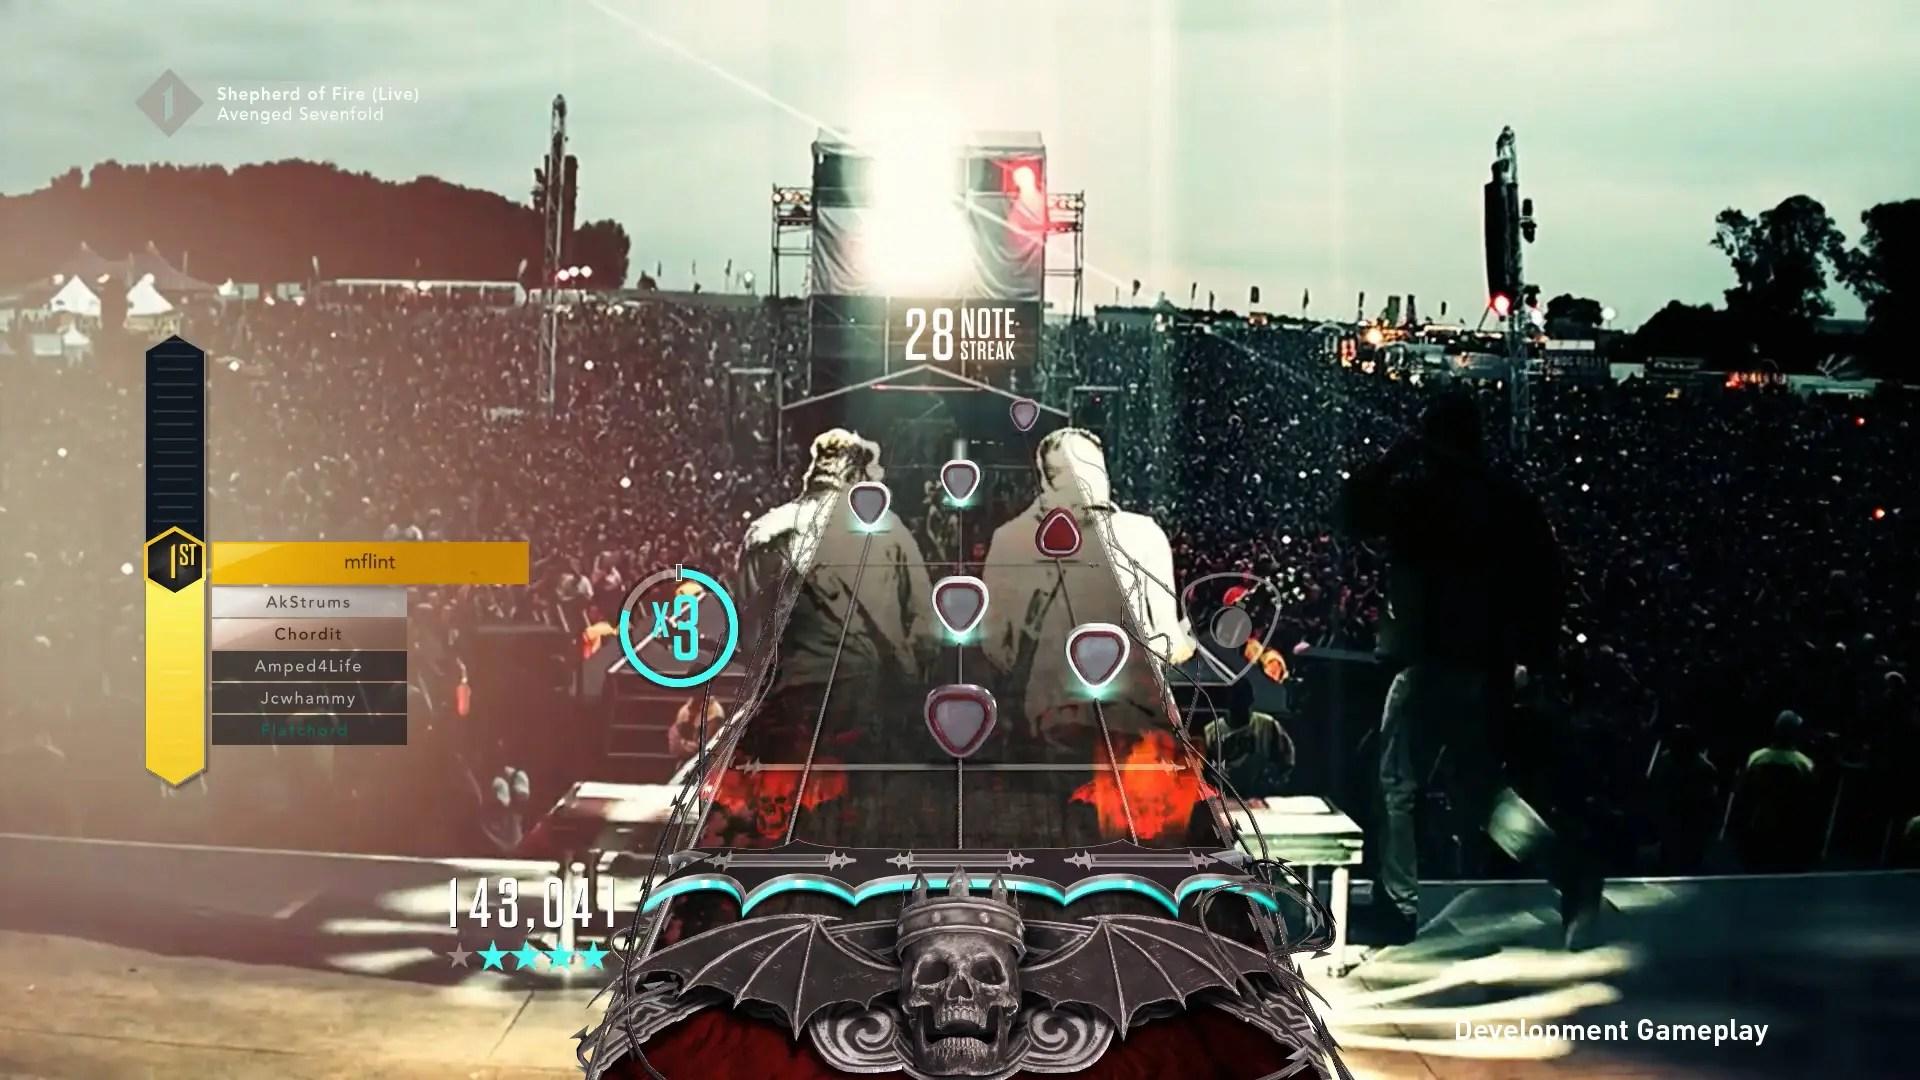 GH Live_Avenged Sevenfold_Still001